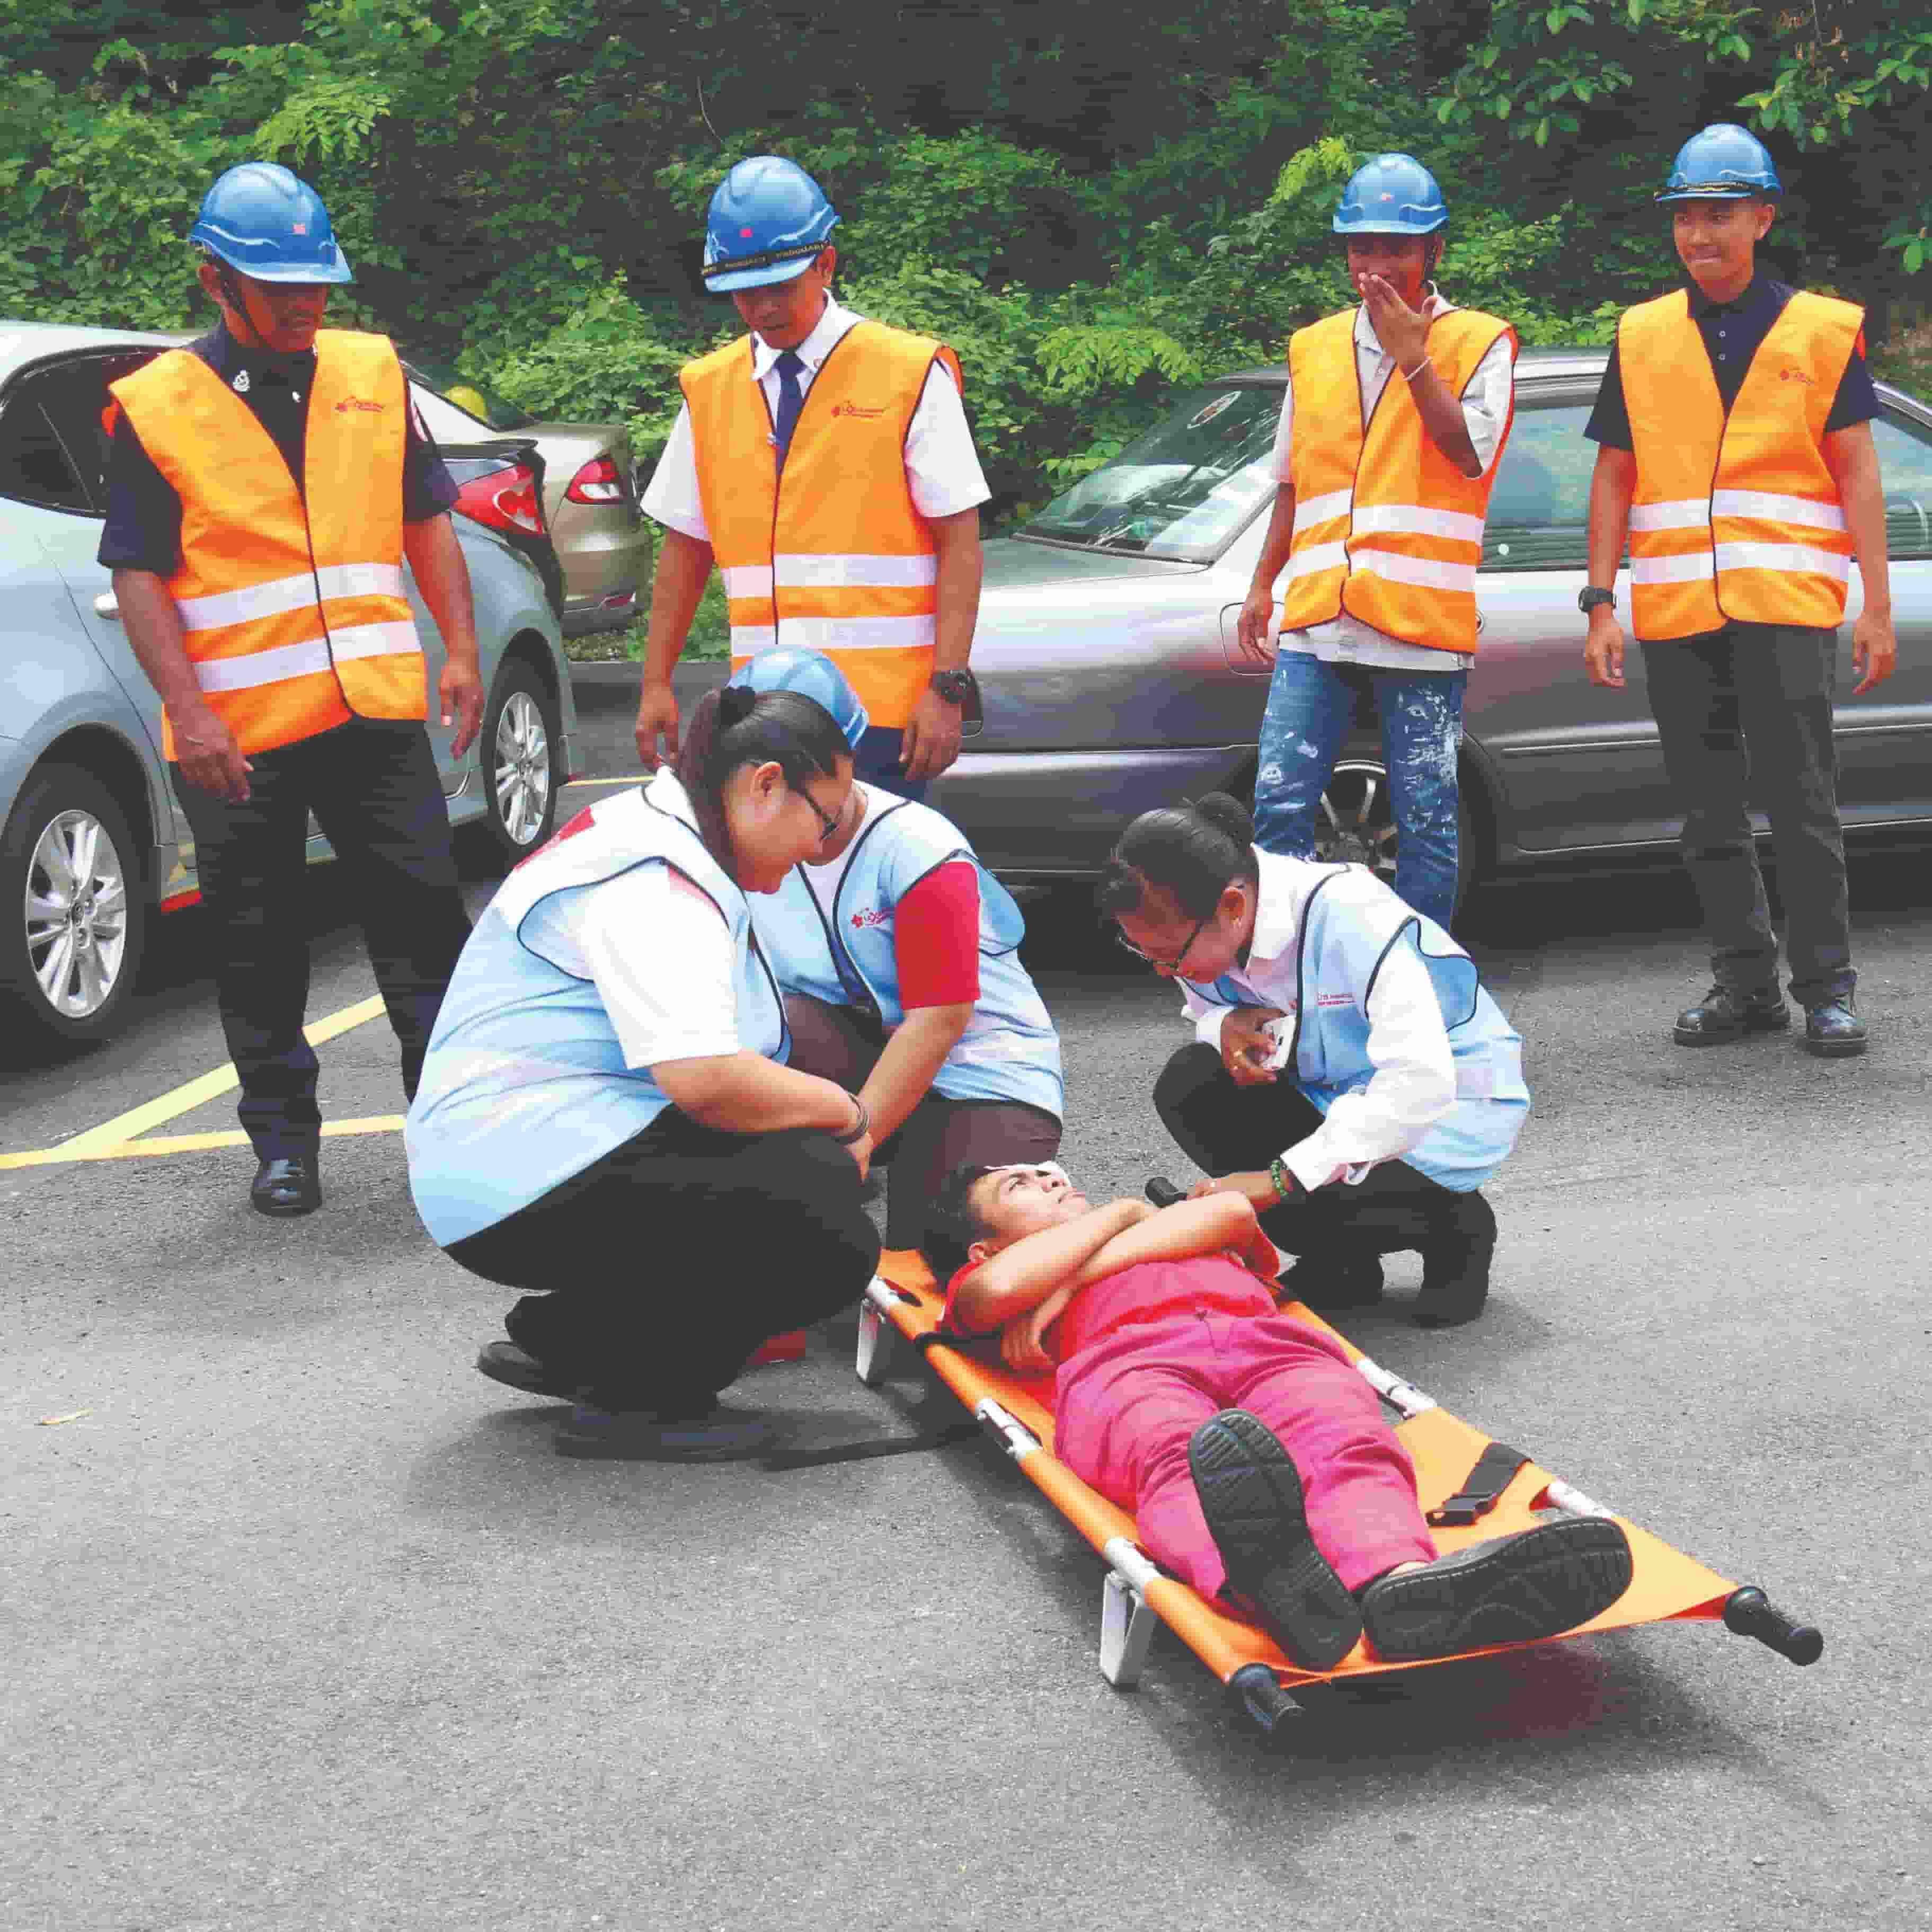 News 2019 - Hotel Practise Emergency Response Plan | Lexis Hibiscus® Port Dickson